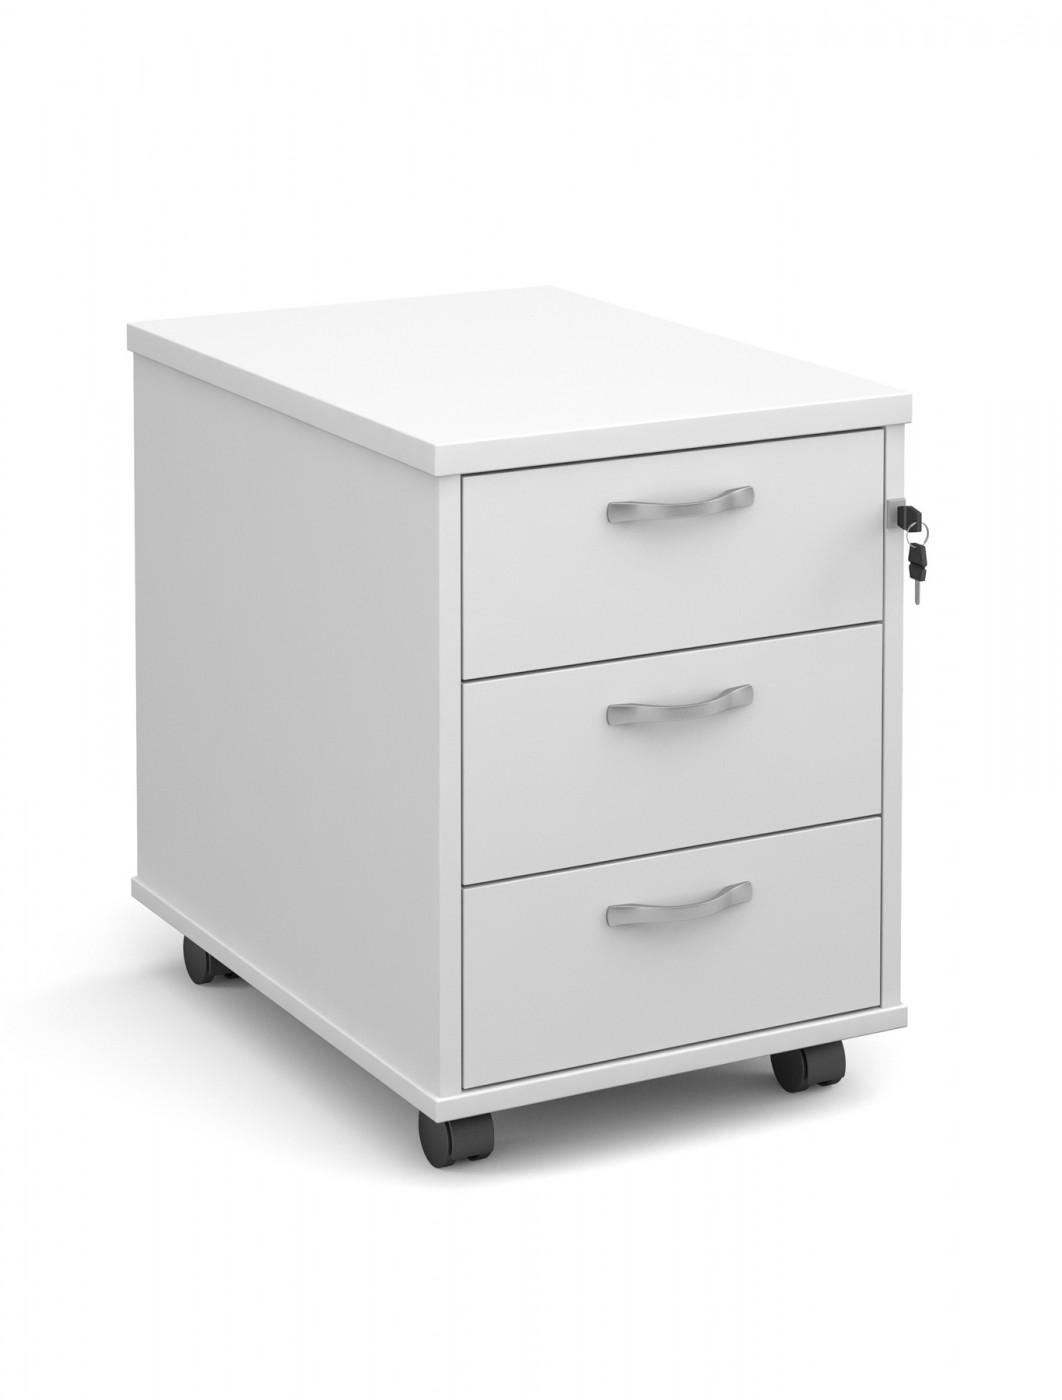 Mobile Pedestal 3 Drawer R3m 121 Office Furniture